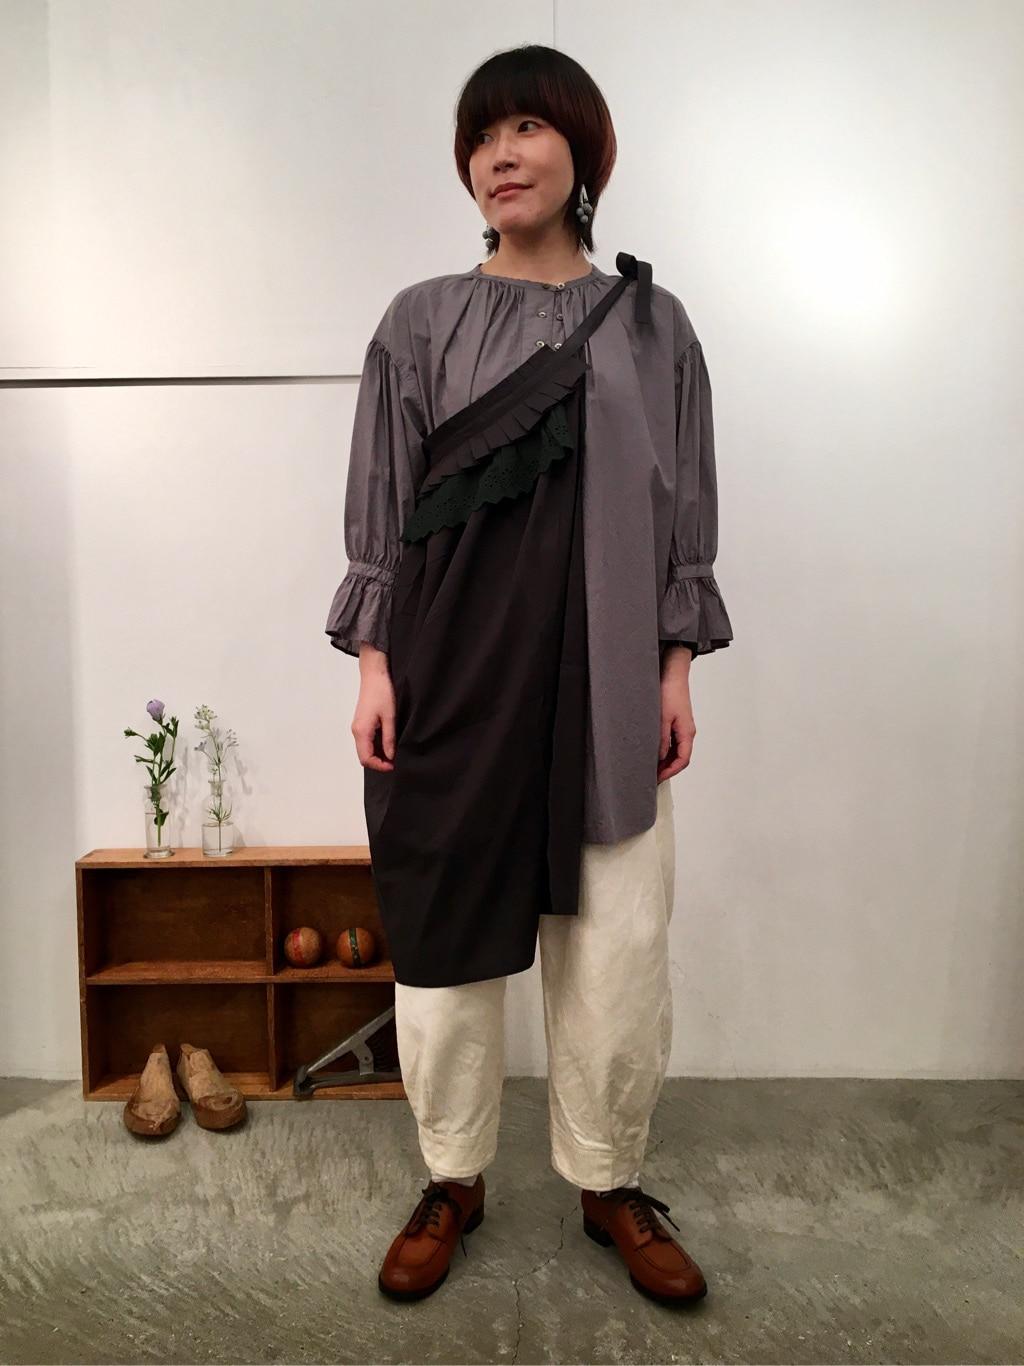 Malle chambre de charme 調布パルコ 身長:160cm 2020.07.20